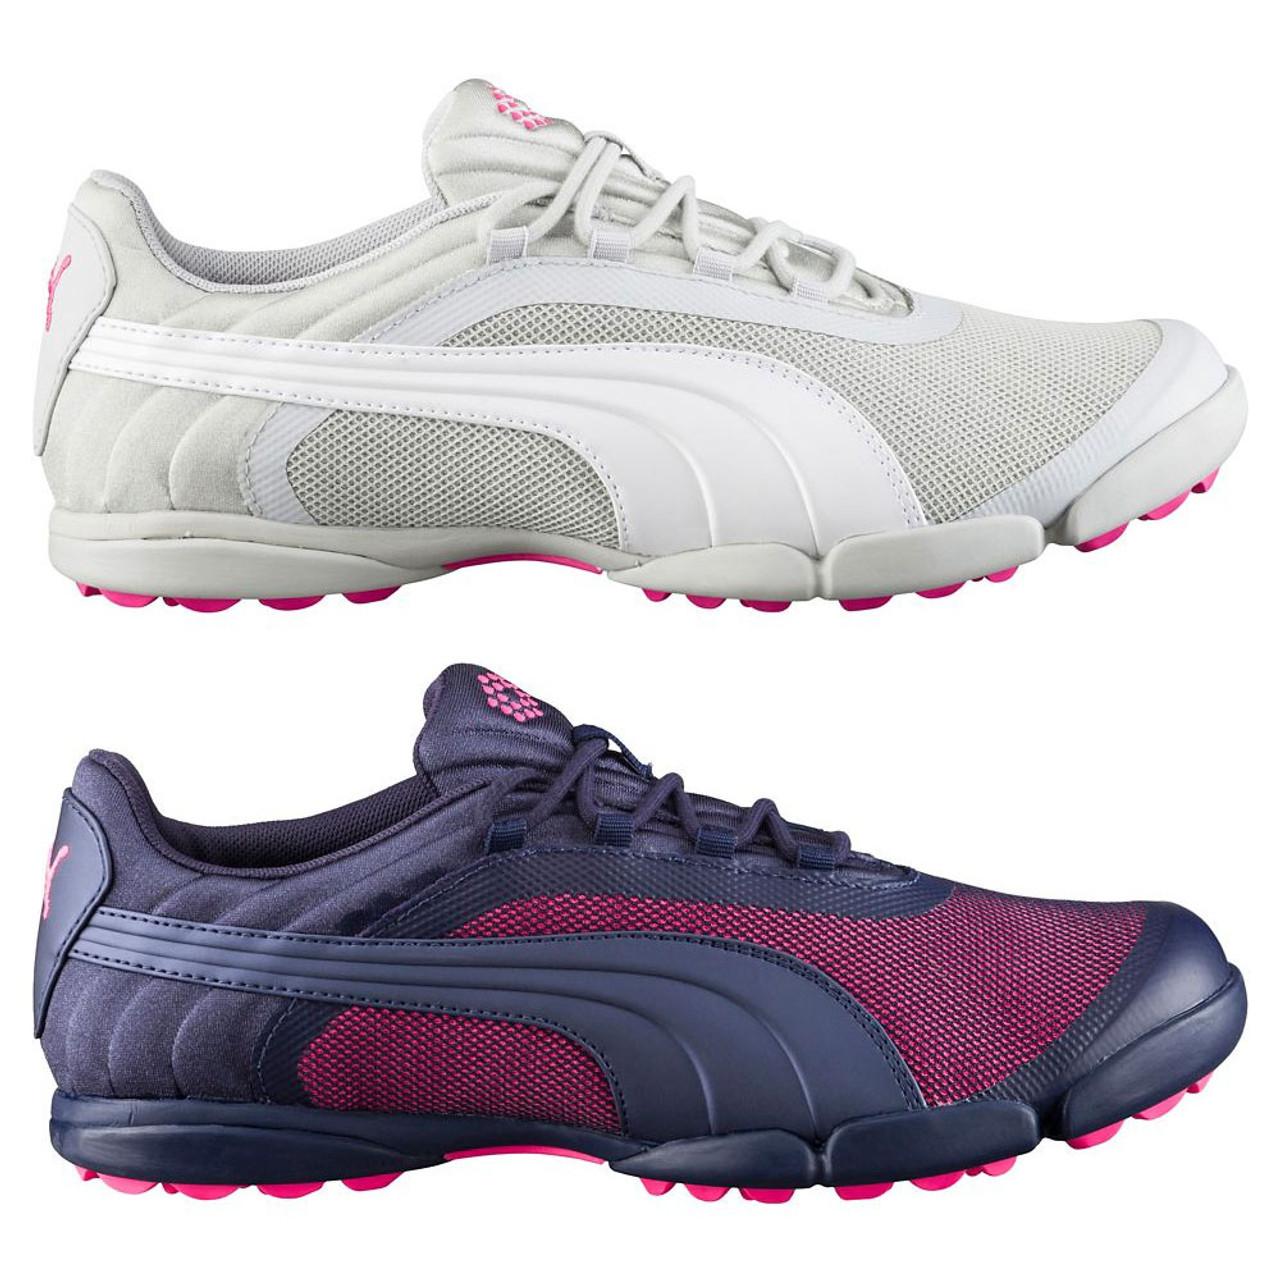 puma tennis shoes 2016